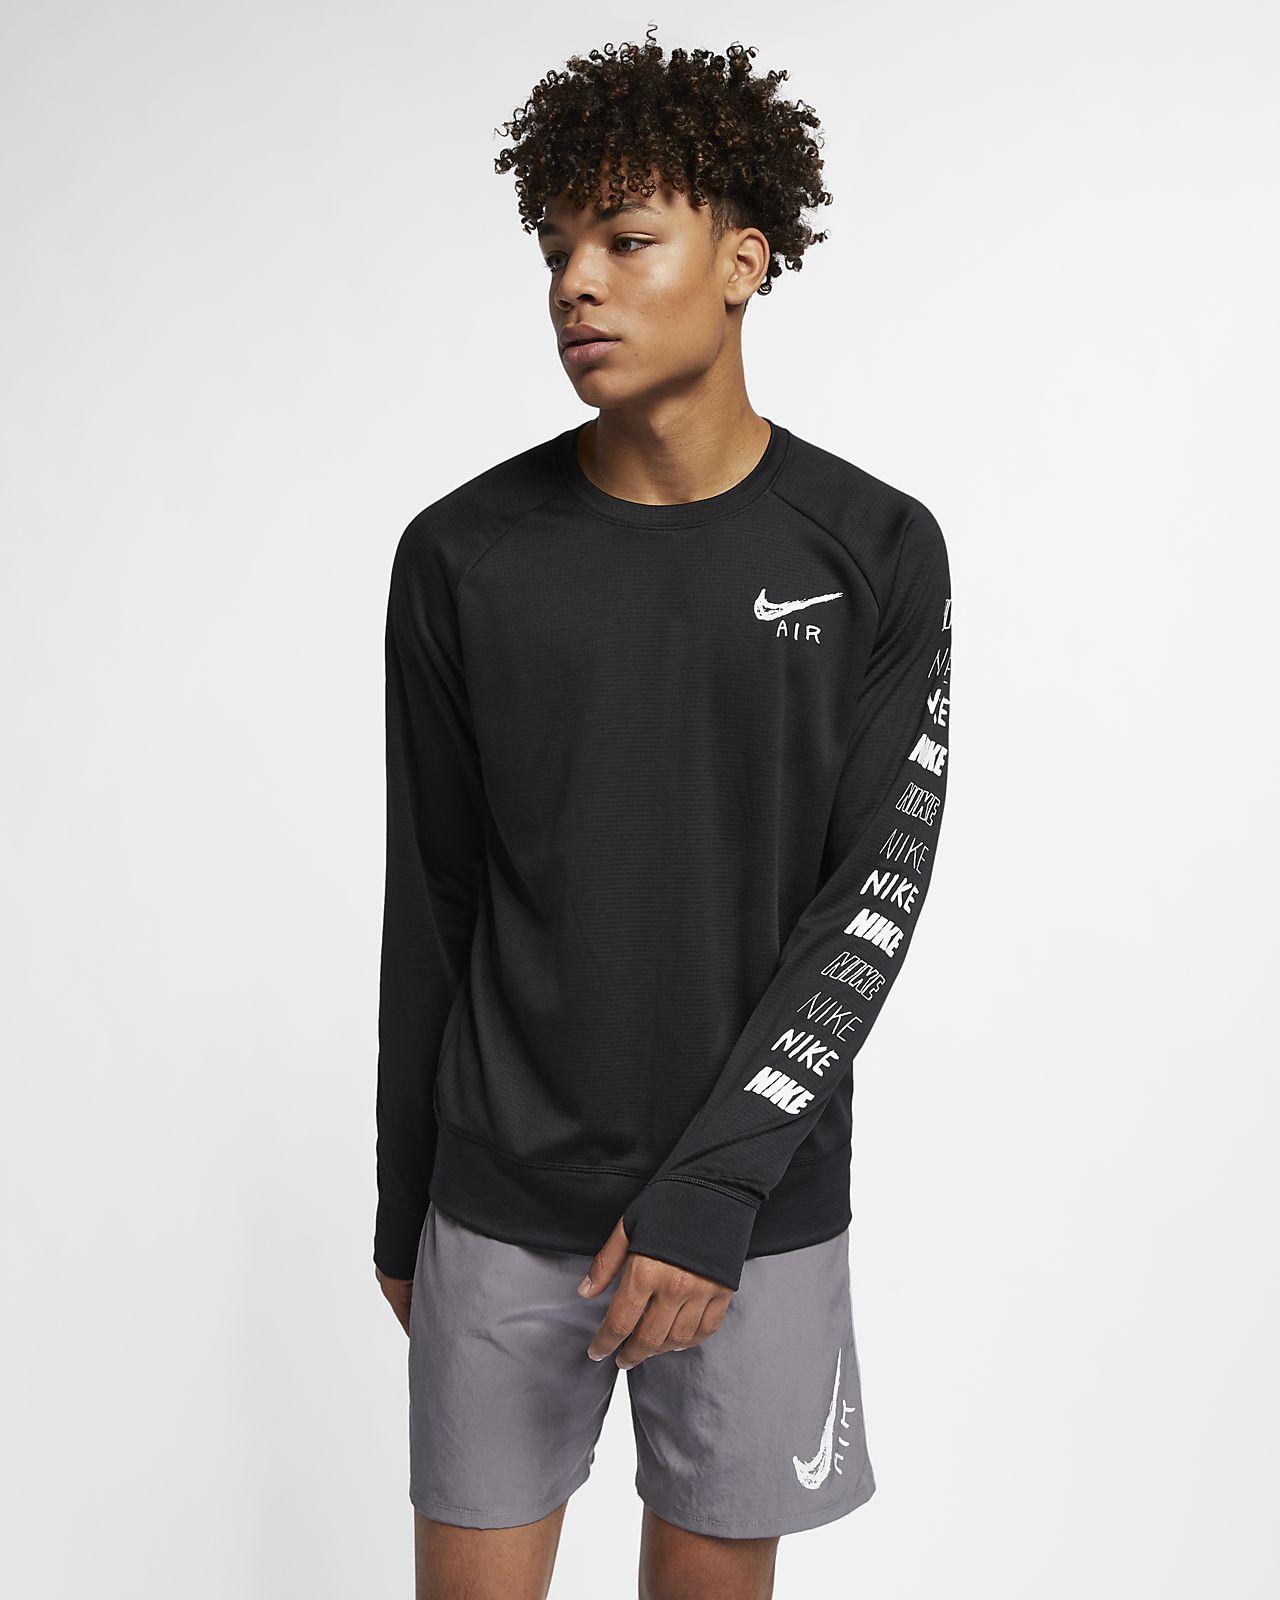 Nike Pacer férfi futófelső